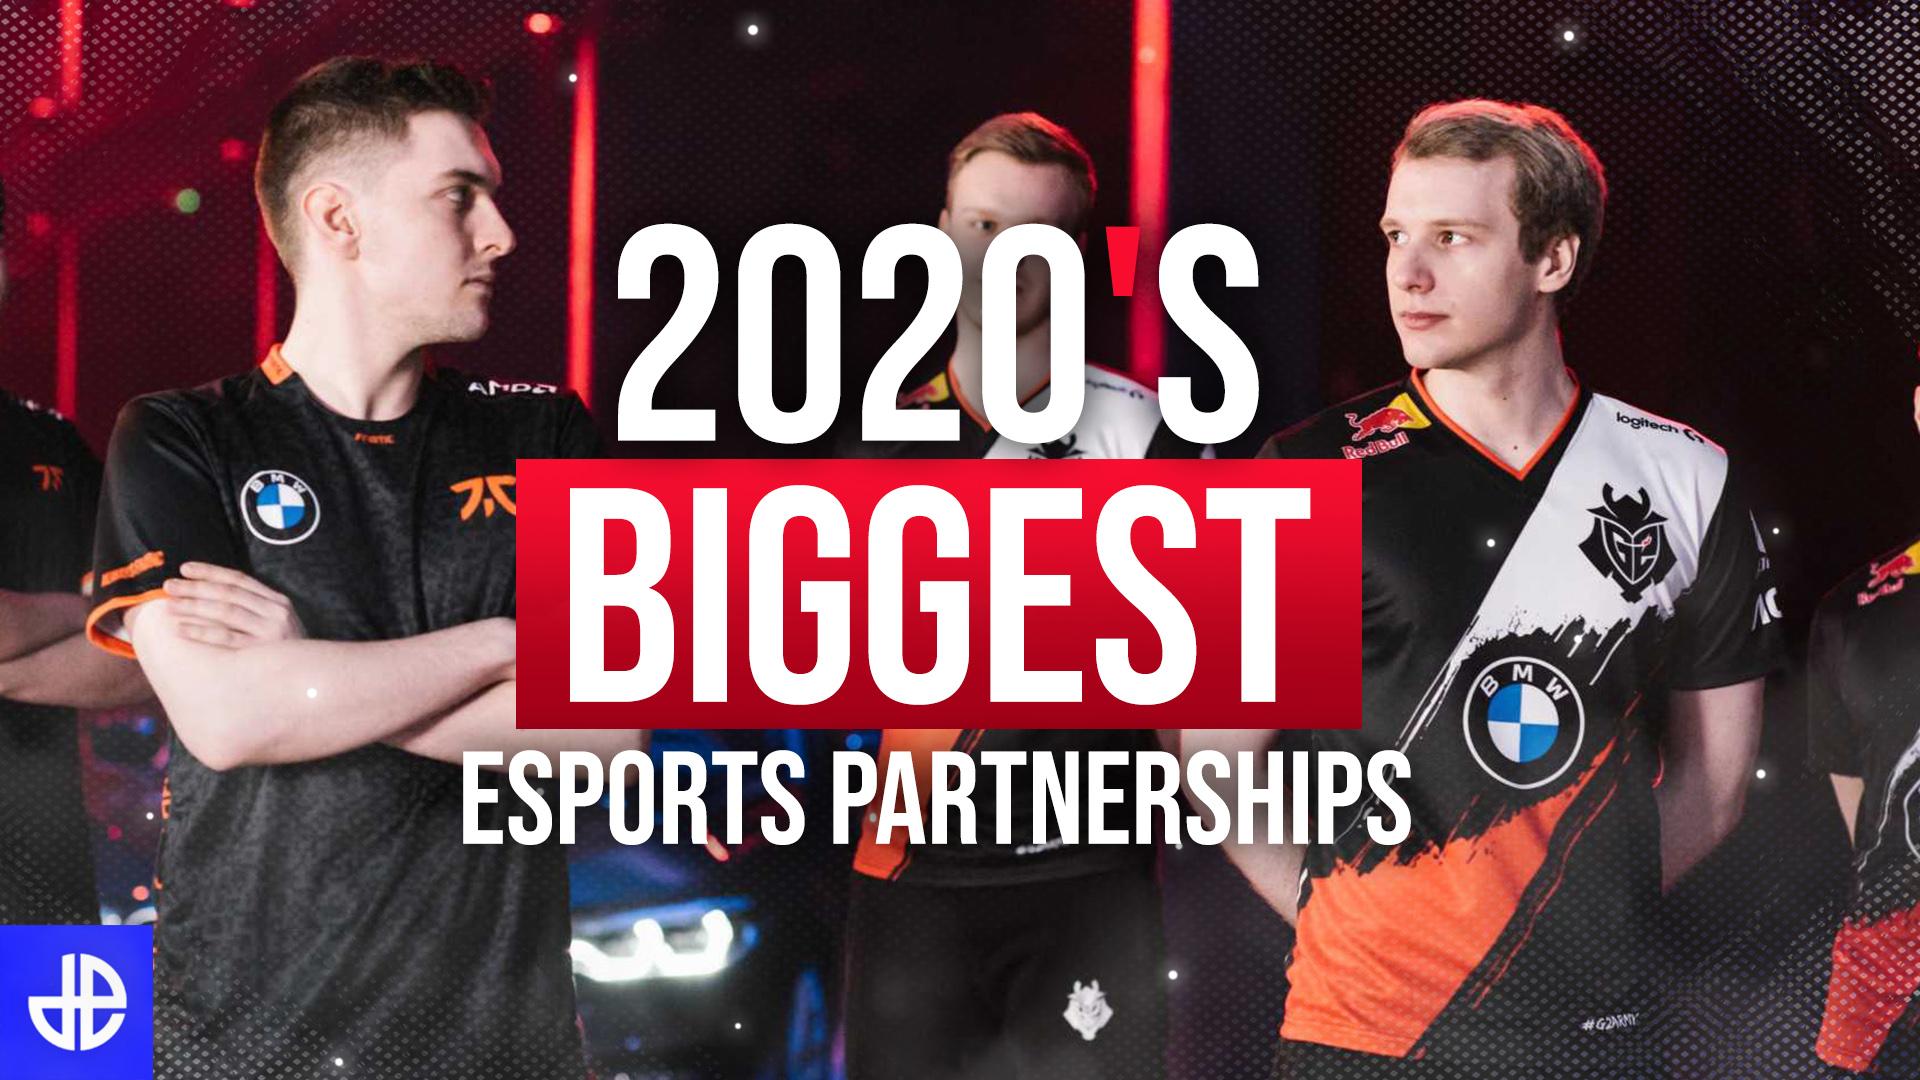 Biggest esports partnerships in 2020